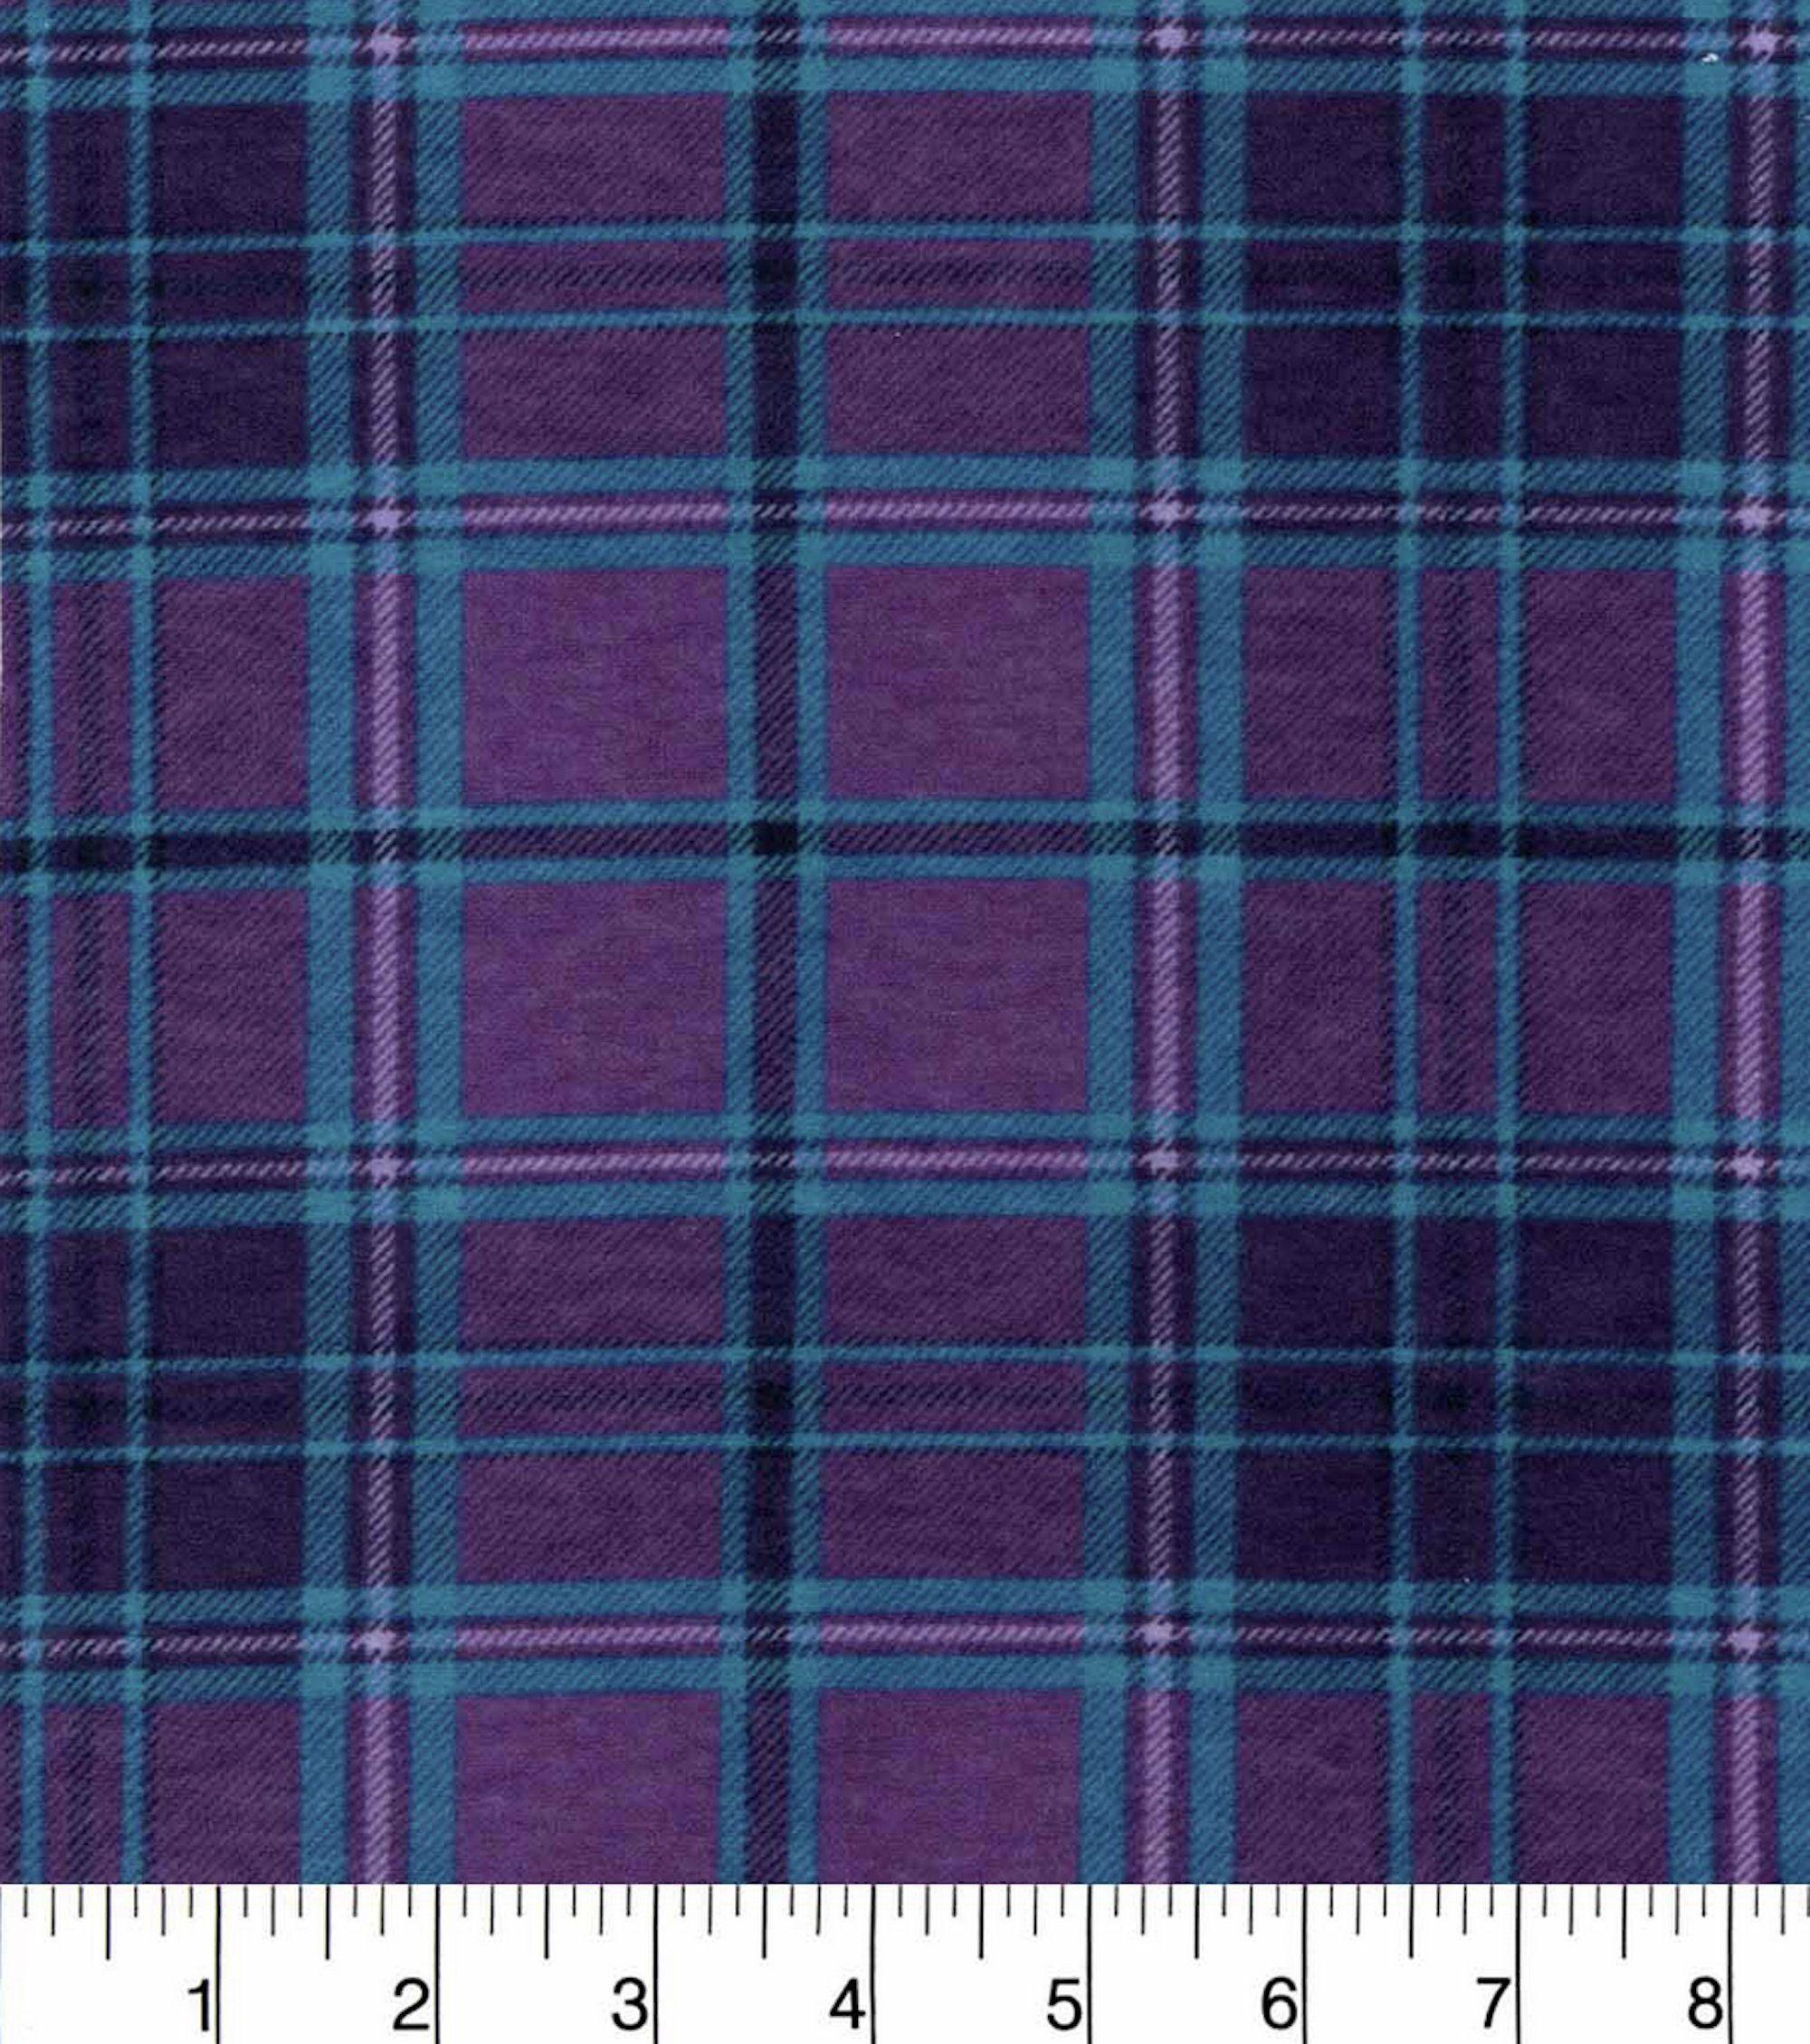 Purple Aqua Plaid Fabric By The Yard 100 Cotton Flannel Fabric Only Plaid Fabric Flannel Fabric Weighted Blanket